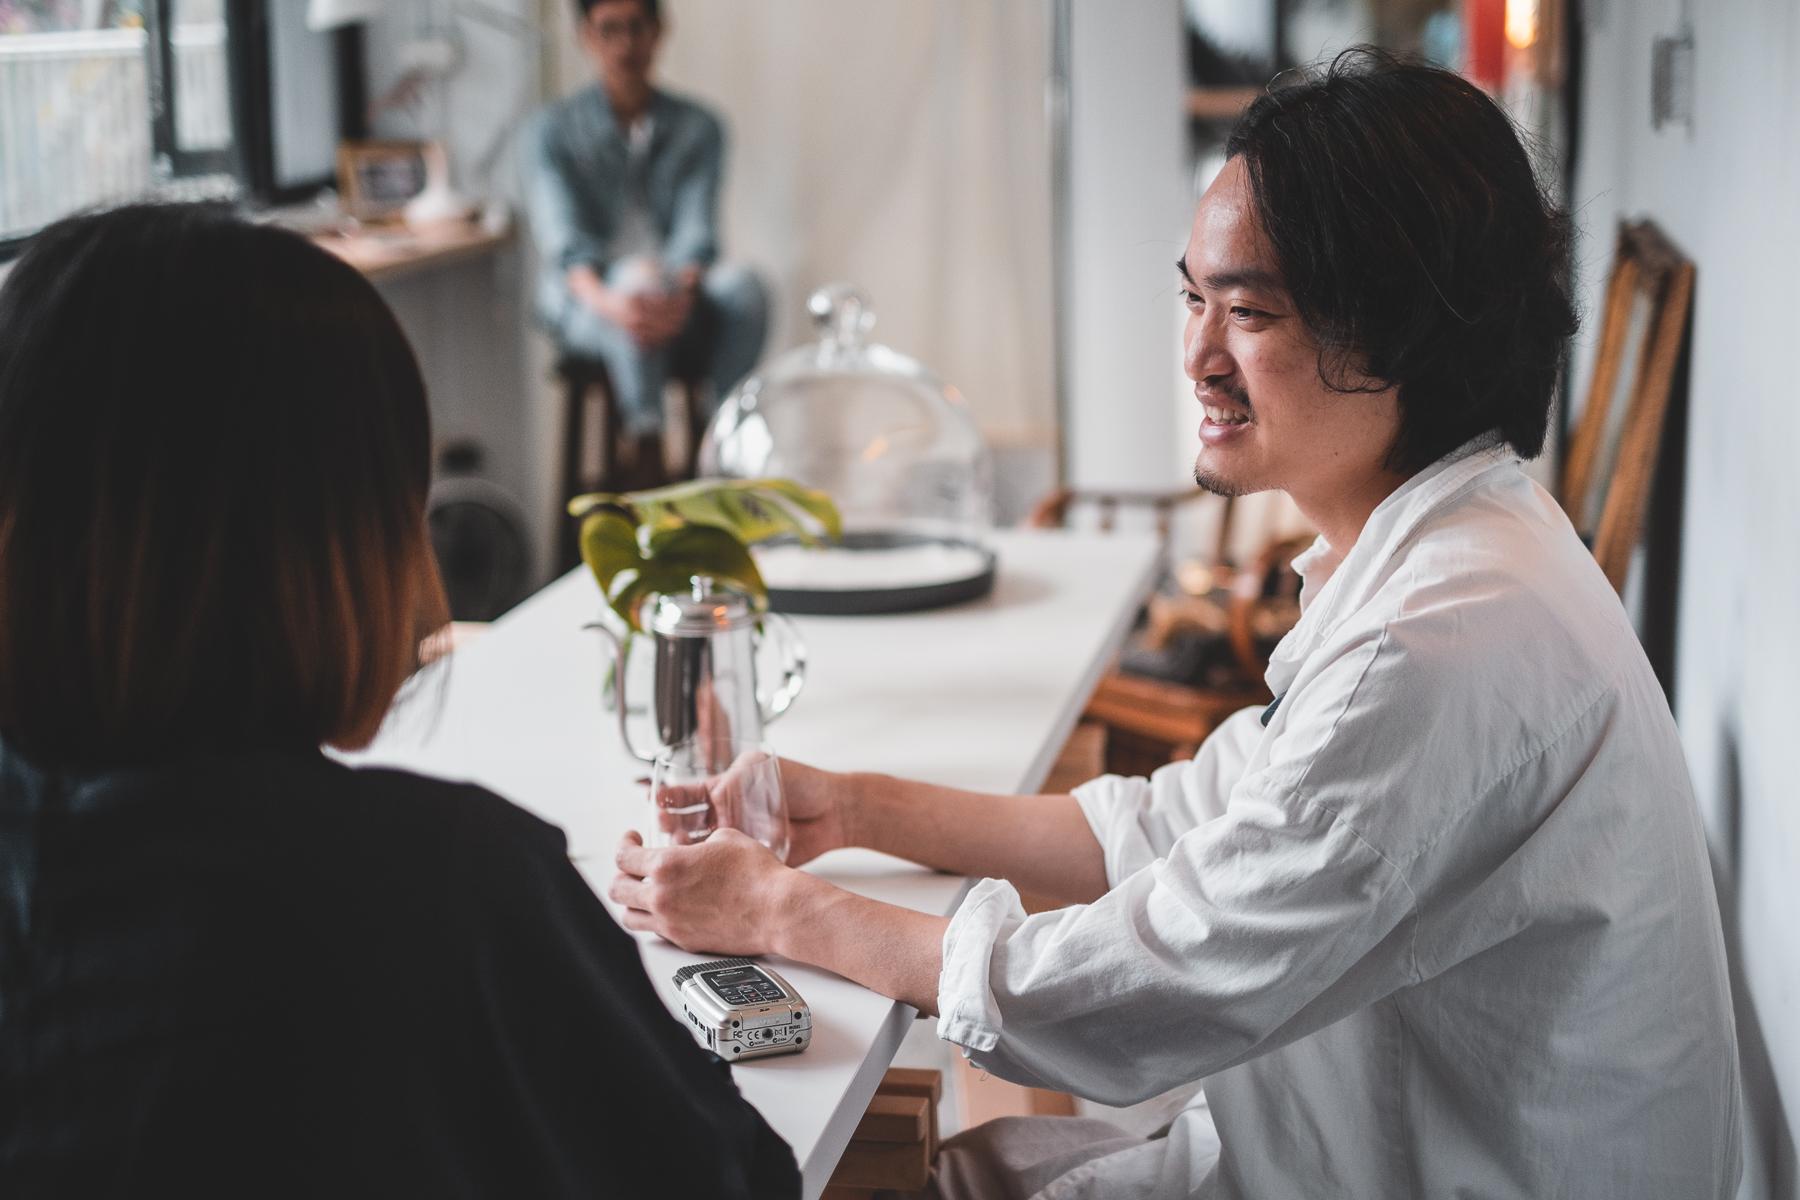 Taipei Taiwan W&M Workshop Coffee Shop Interview - FUJIFilmXT33514 - Yes! Please Enjoy by Fanning Tseng-16.jpg